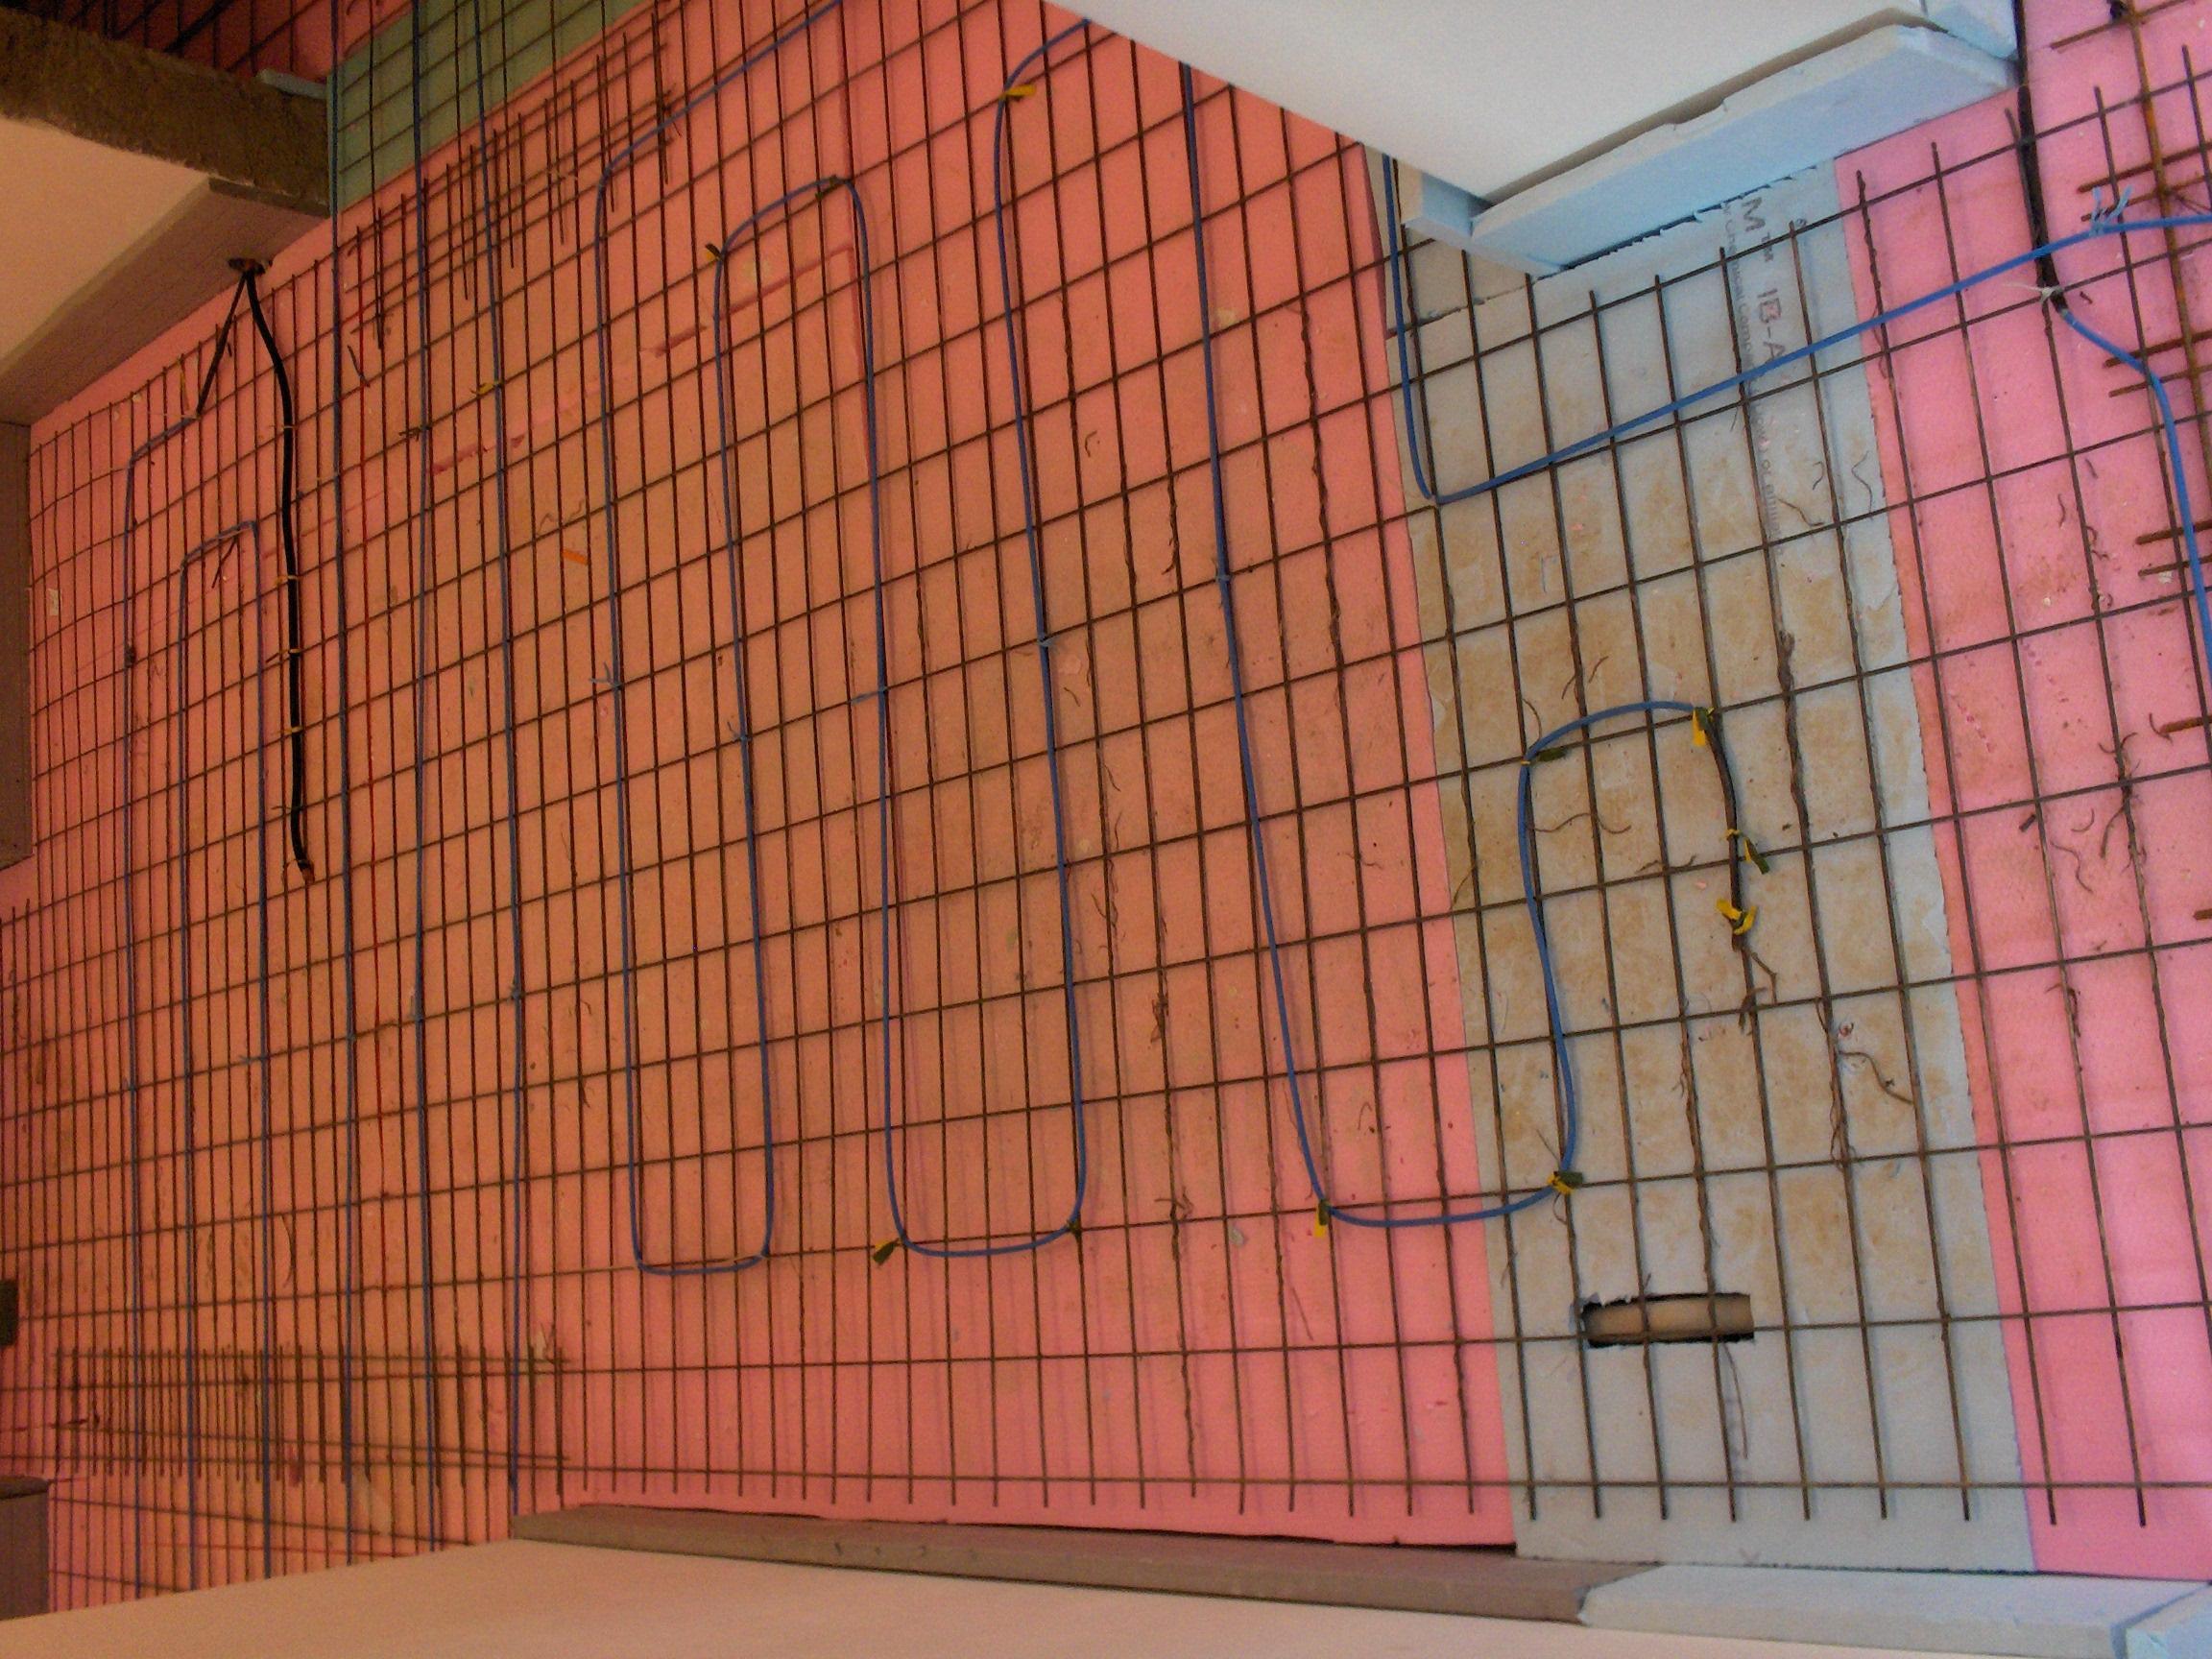 Incalzire prin pardoseala resedinta Lipia - Snagov RAYCHEM - Poza 14